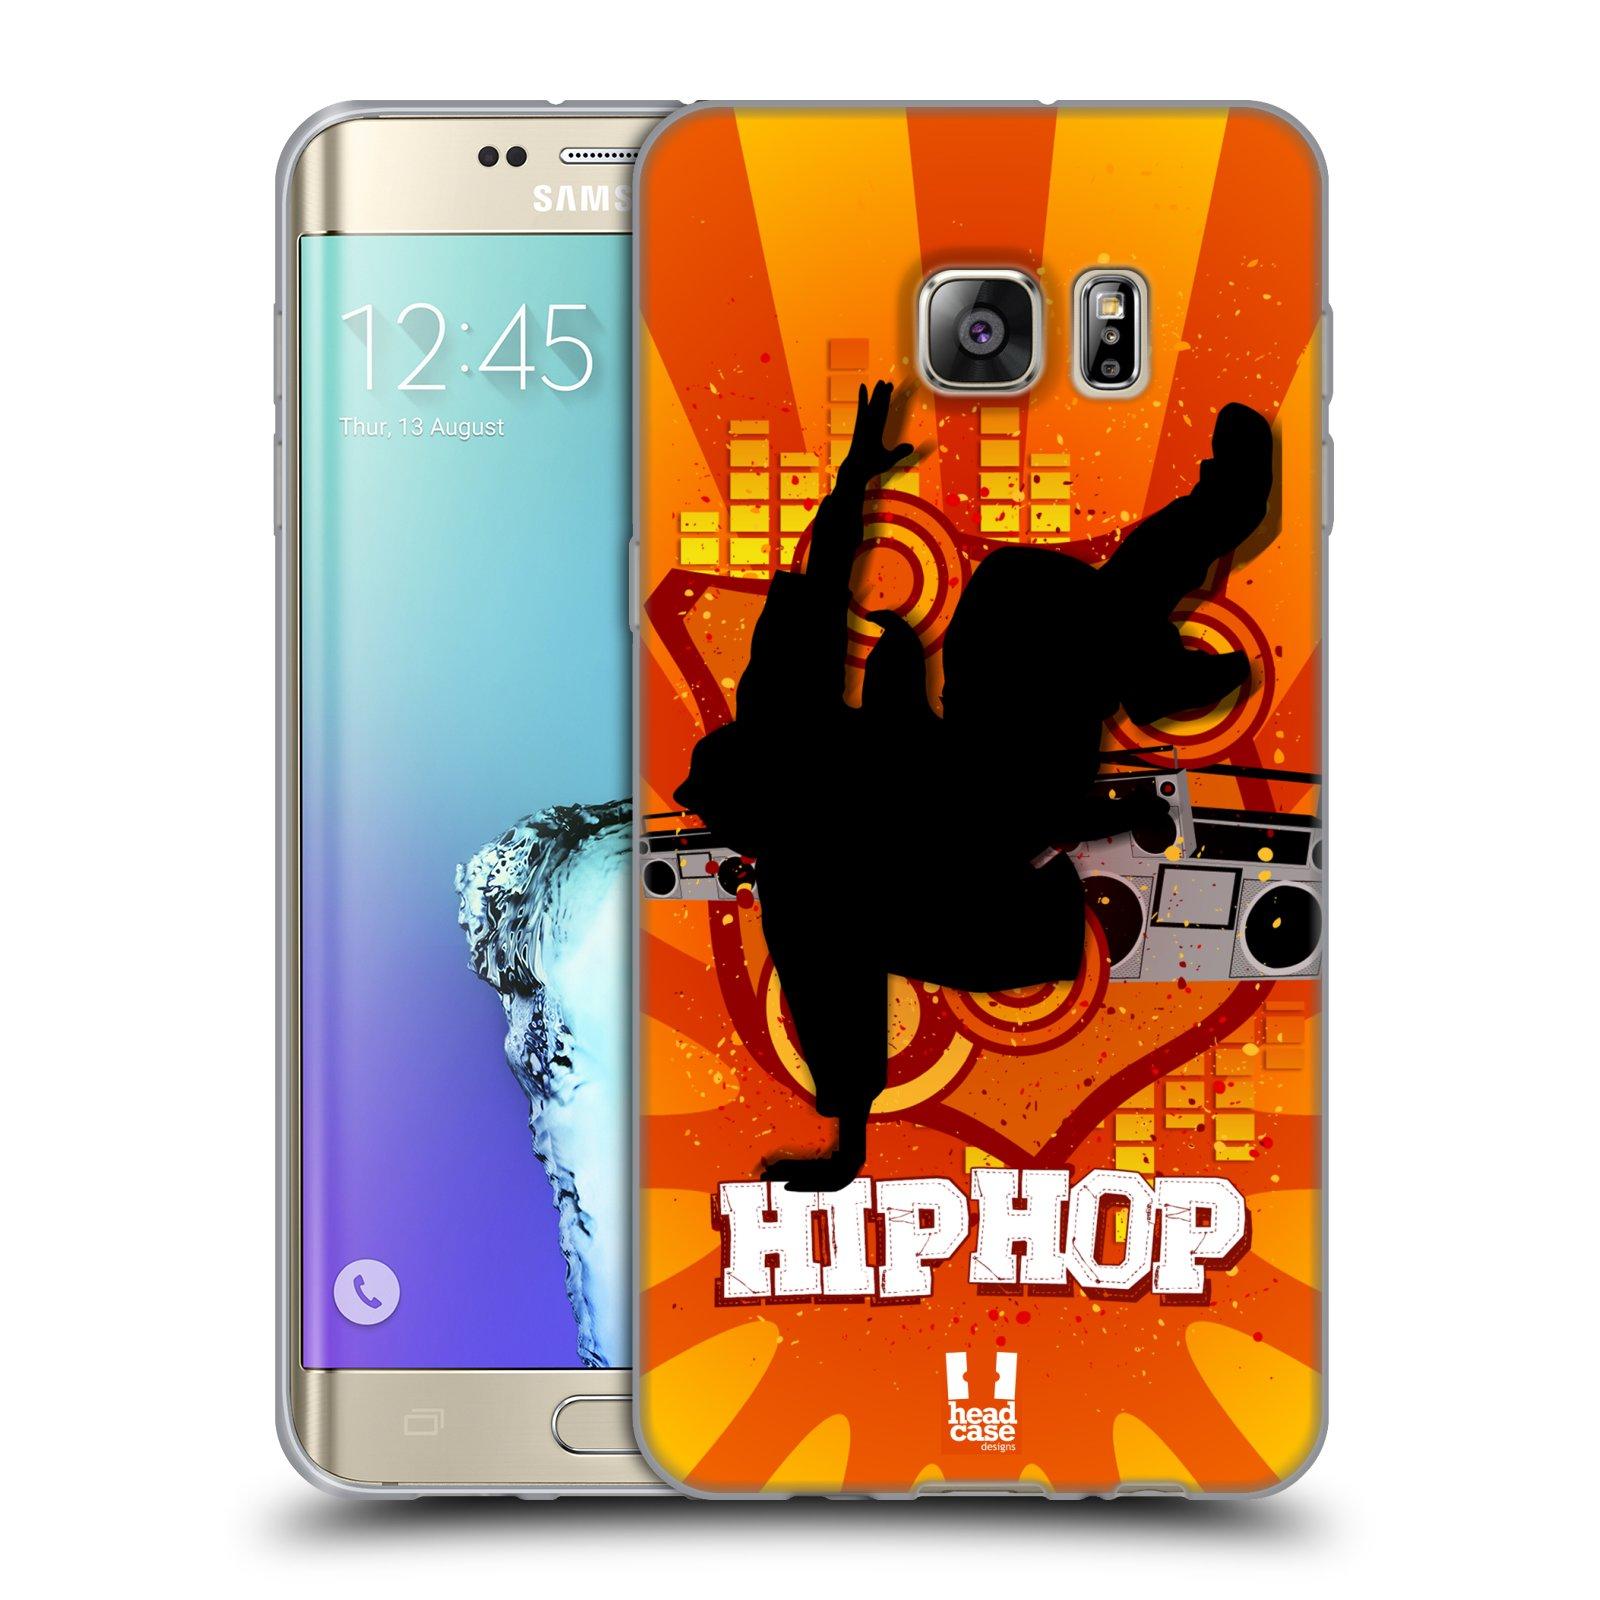 HEAD CASE silikonový obal na mobil Samsung Galaxy S6 EDGE PLUS vzor TANEC SILUETA HIP HOP